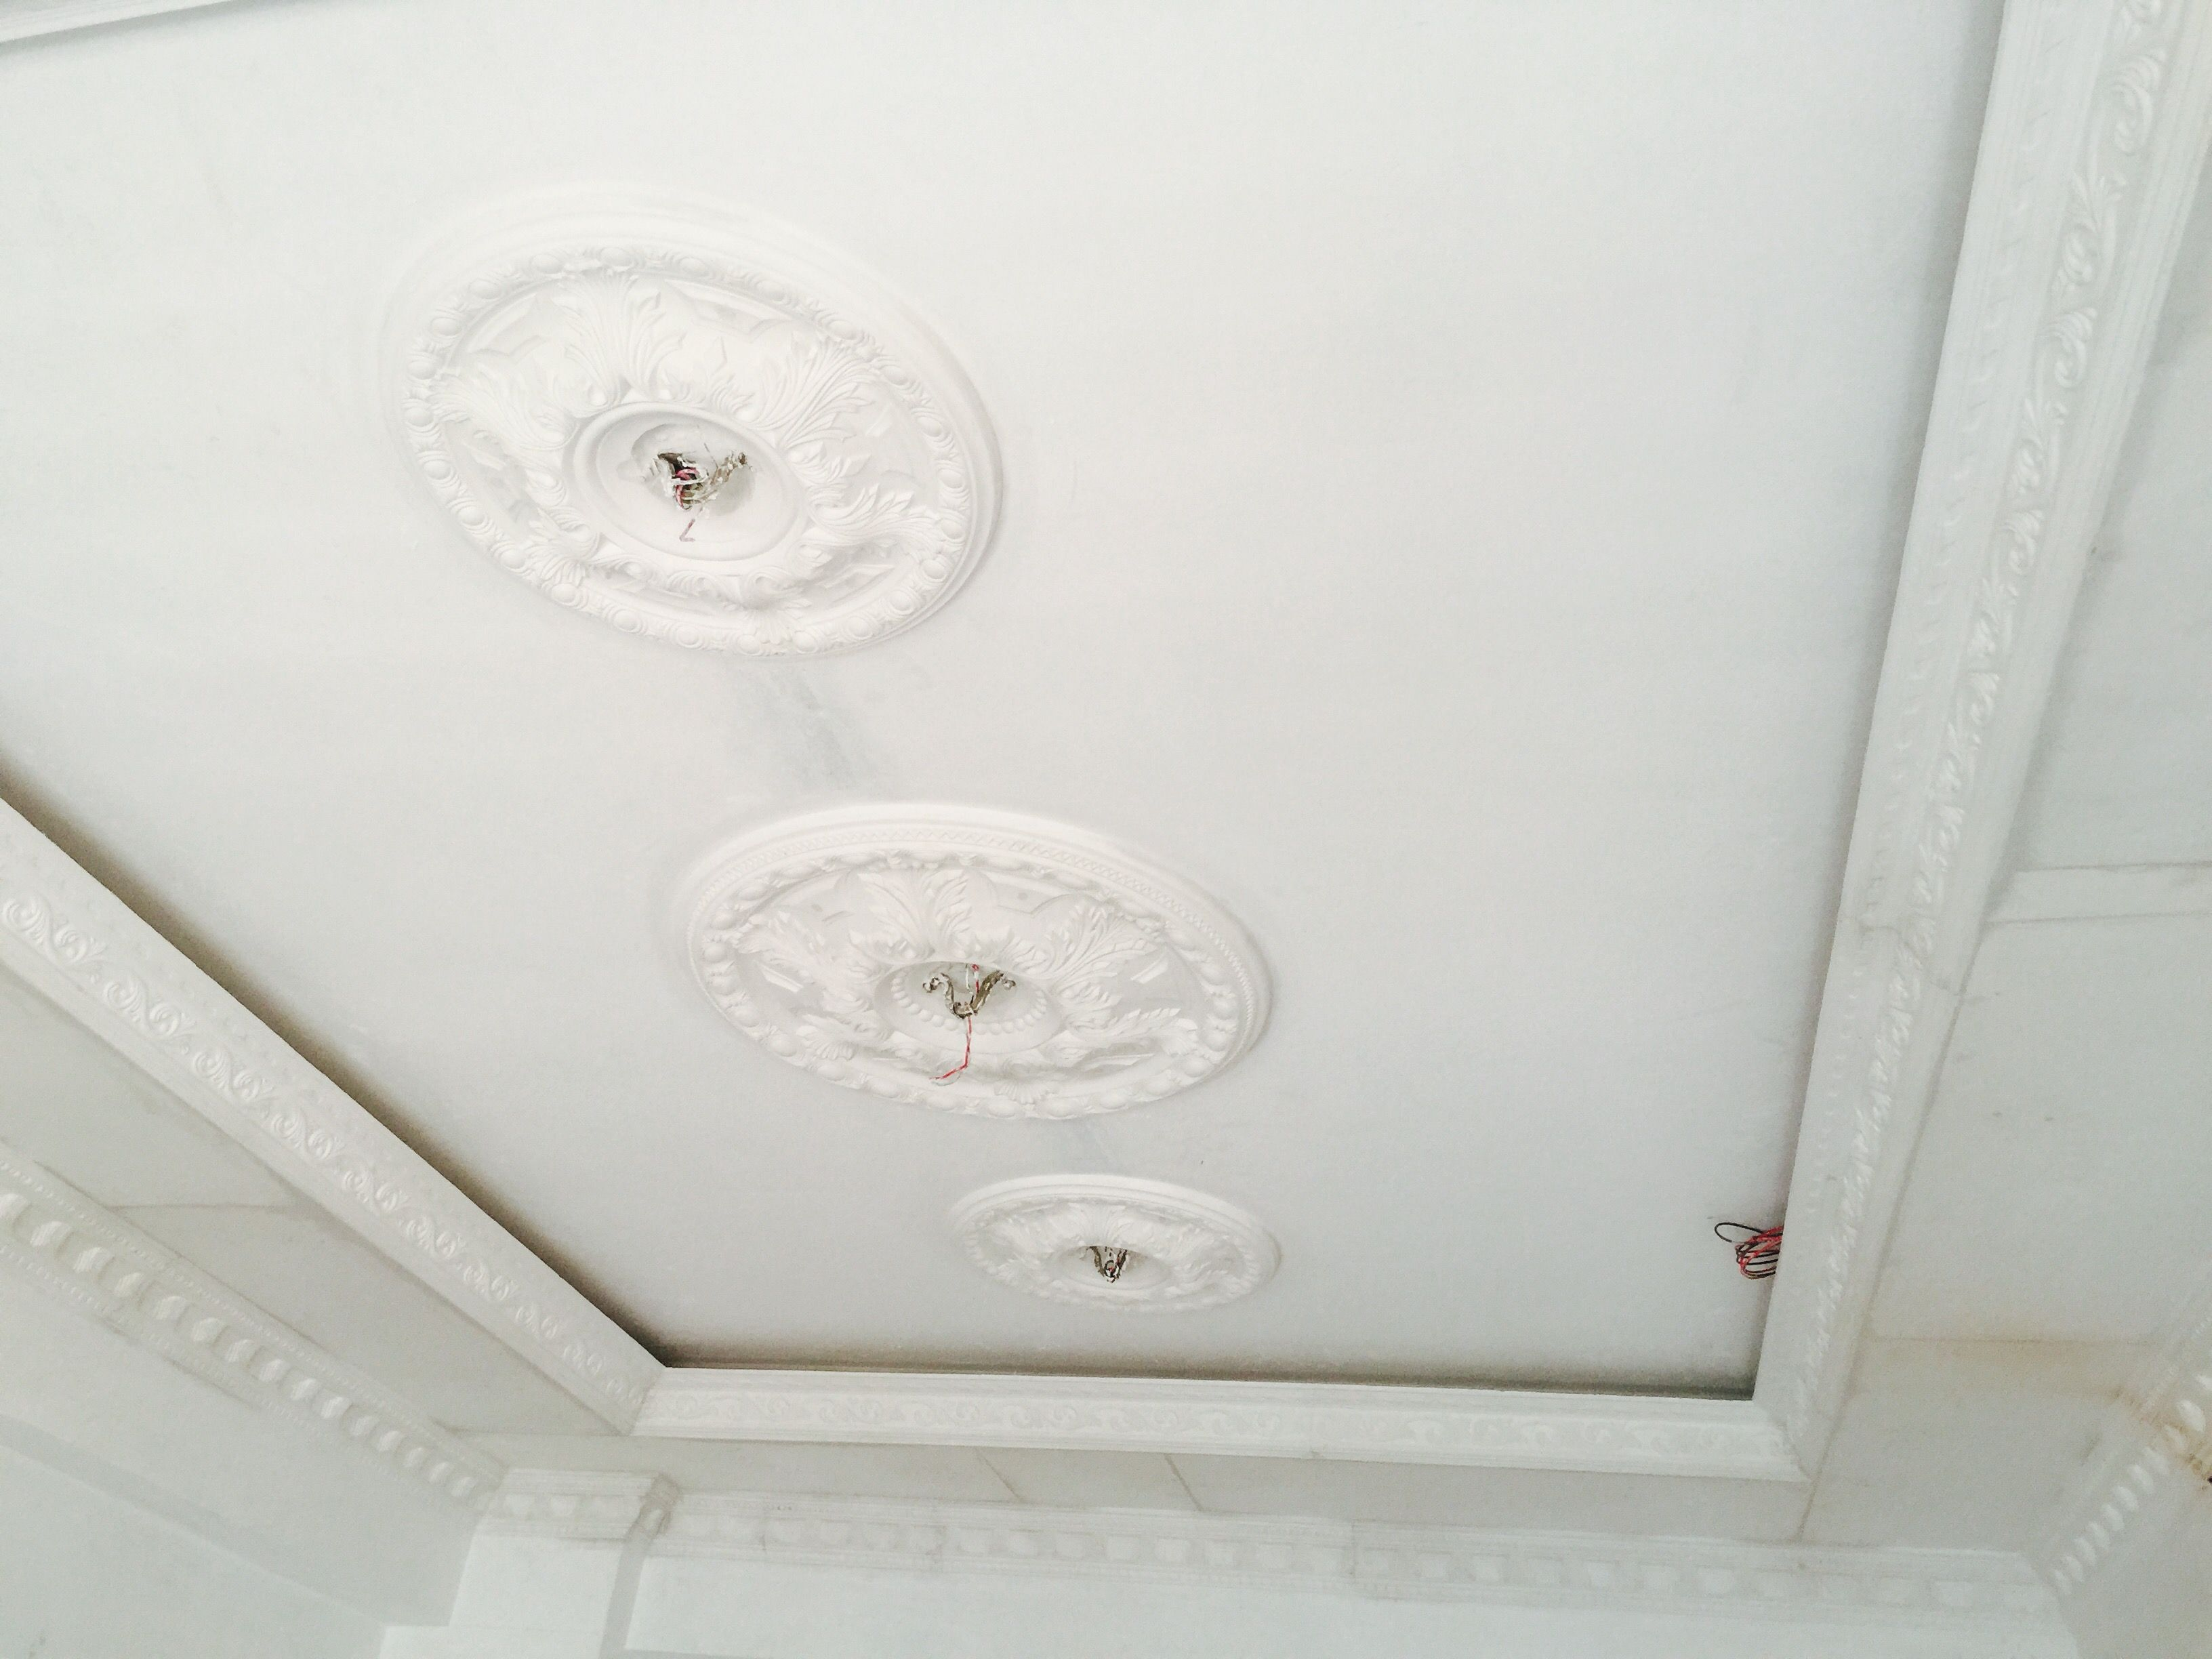 Manufacturer of gypsum false ceiling gypsum ceiling work gypsum manufacturer of gypsum false ceiling gypsum ceiling work gypsum ceiling tile gypsum ceiling dailygadgetfo Gallery